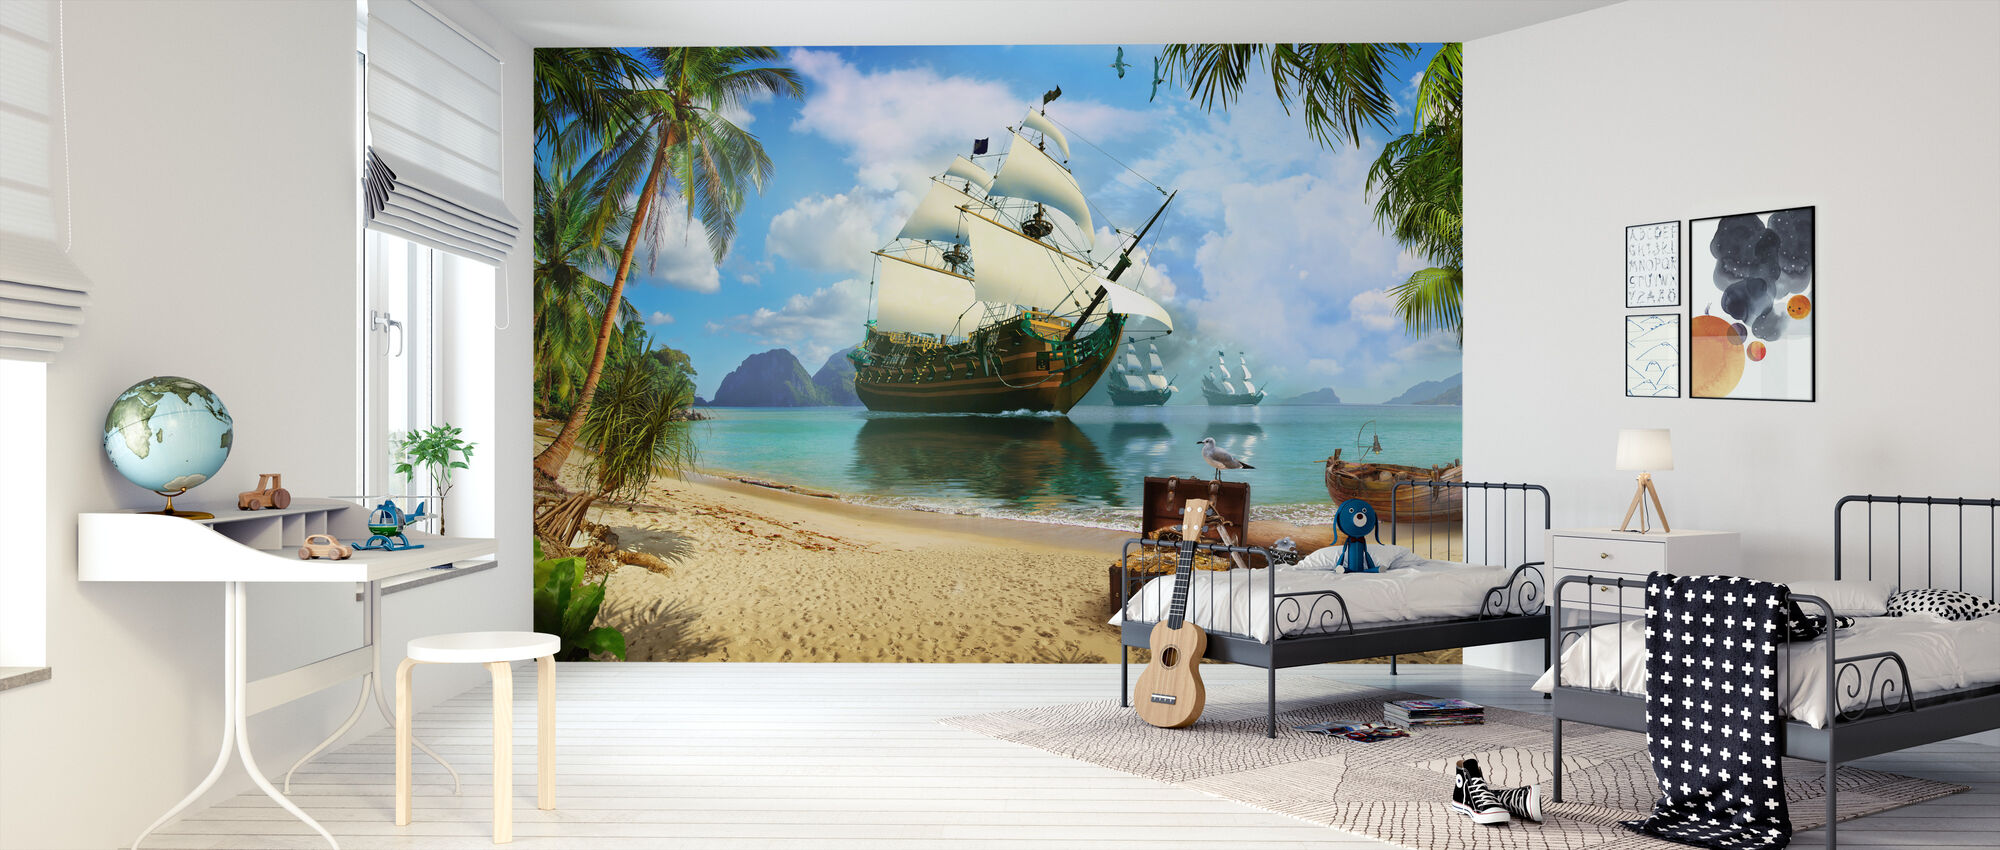 Pirate Treasure Island - Wallpaper - Kids Room